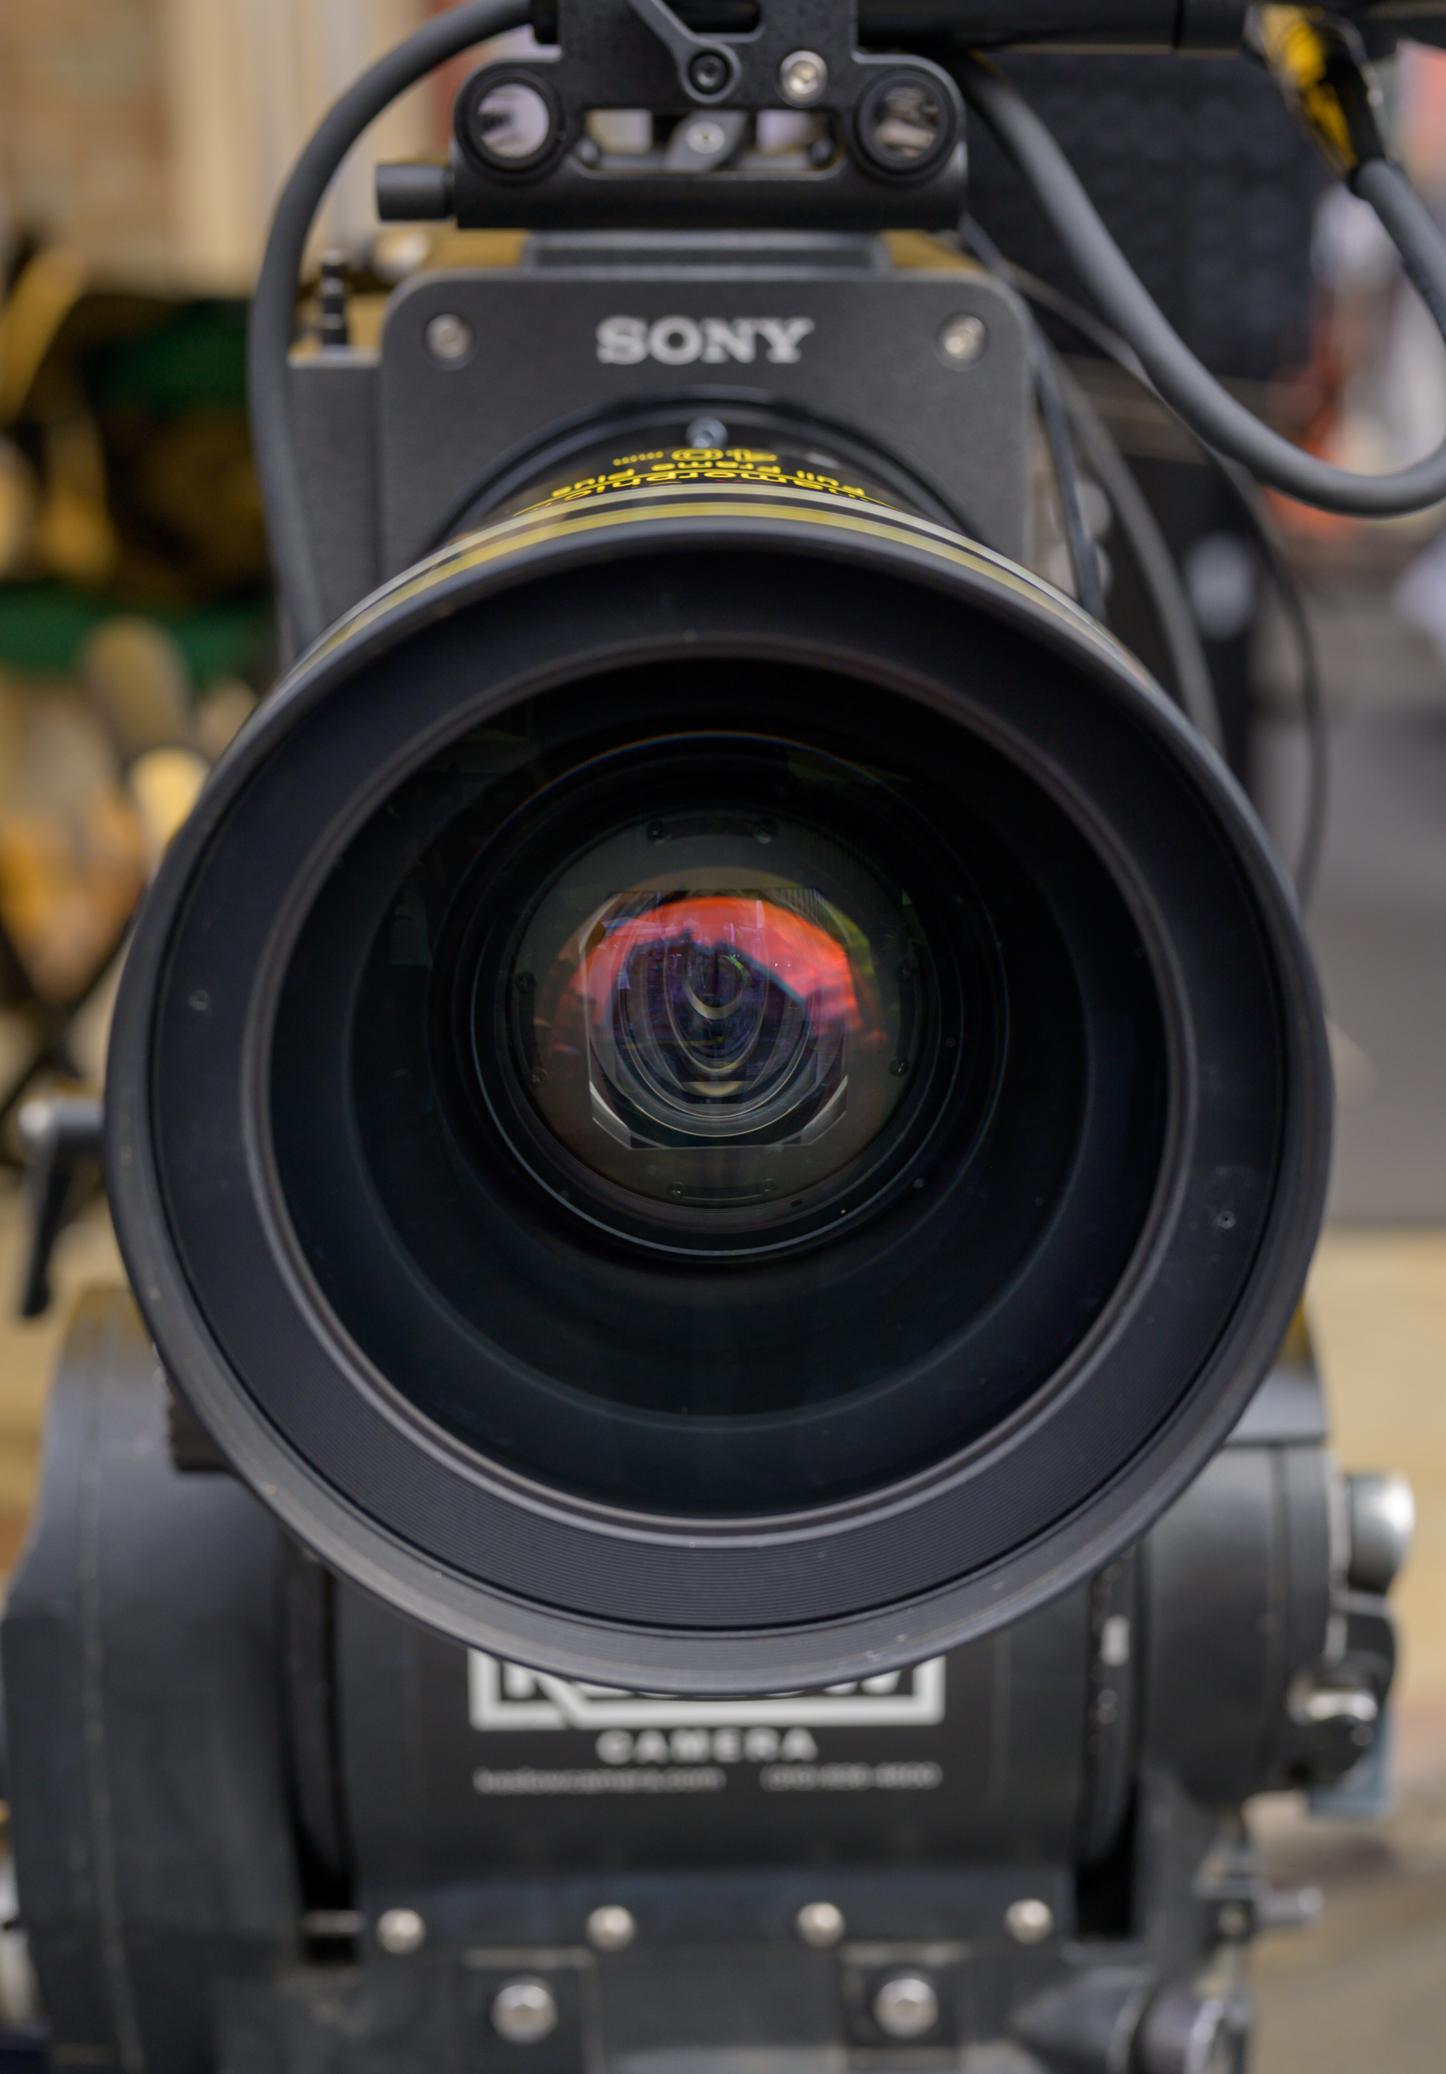 Cine Gear: Cooke Anamorphic/i Full Frame Plus Standard and SF Lenses 1